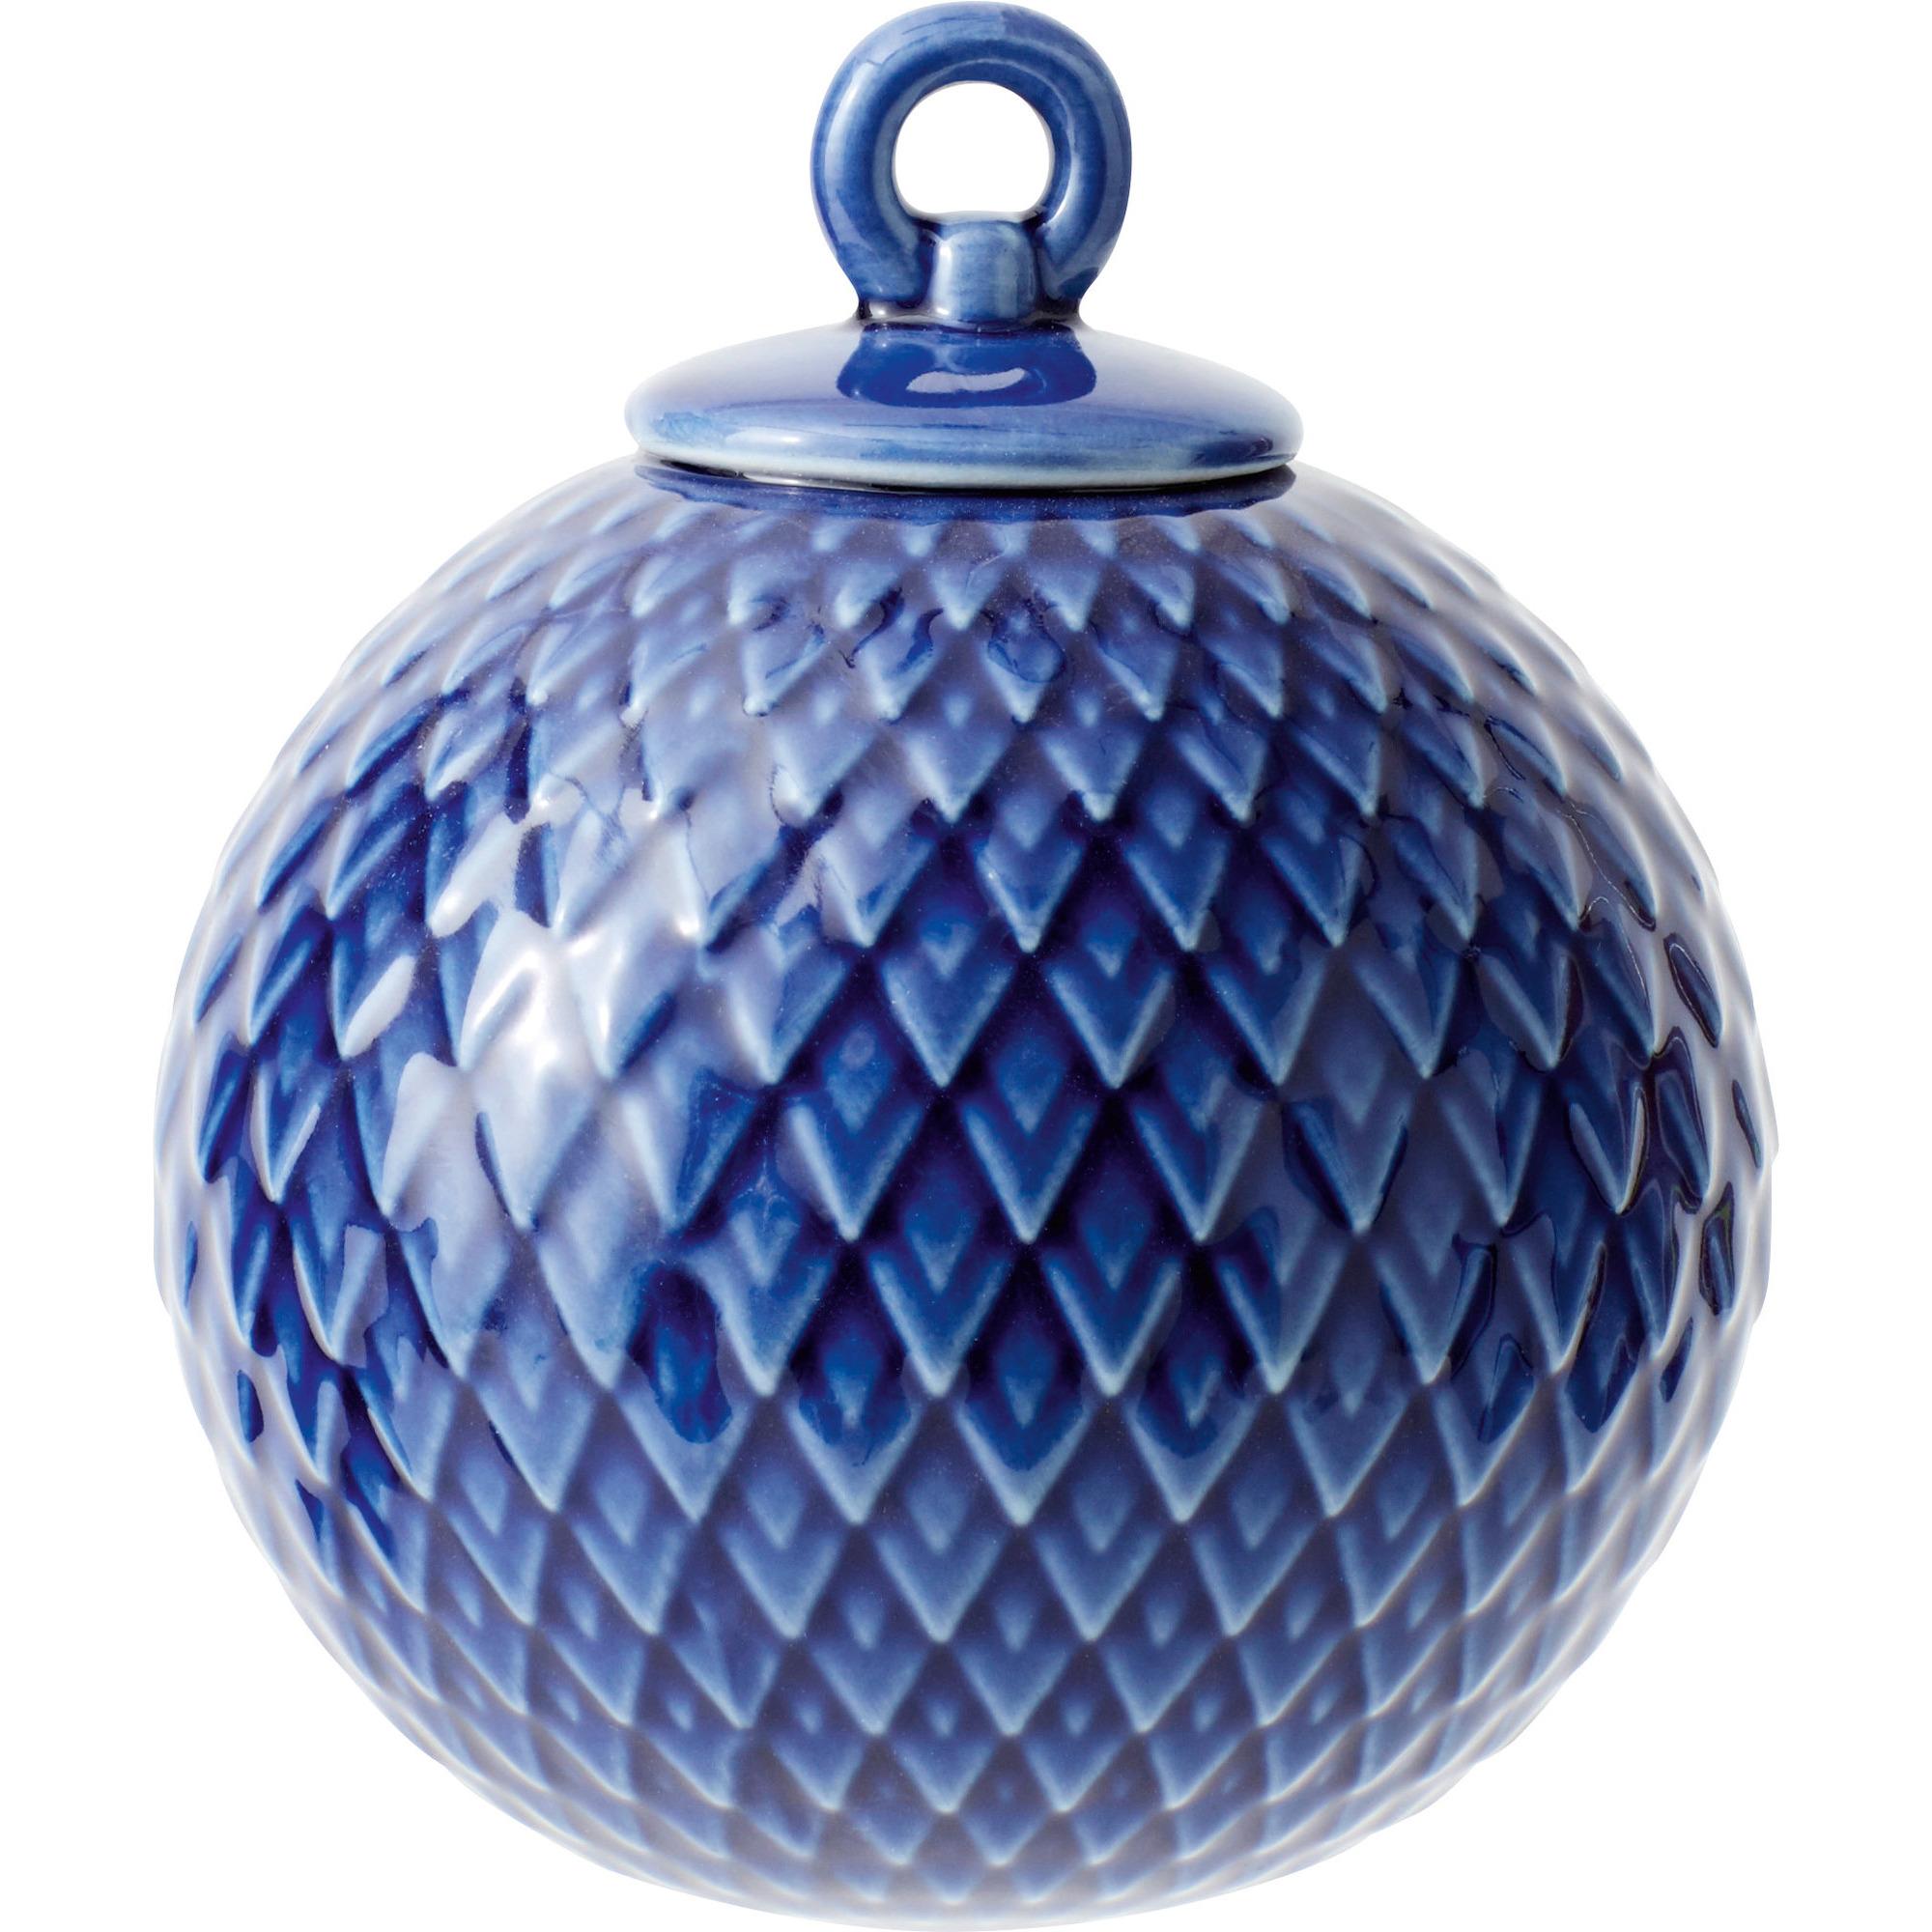 Lyngby Porcelæn Rhombe kula midnight blue